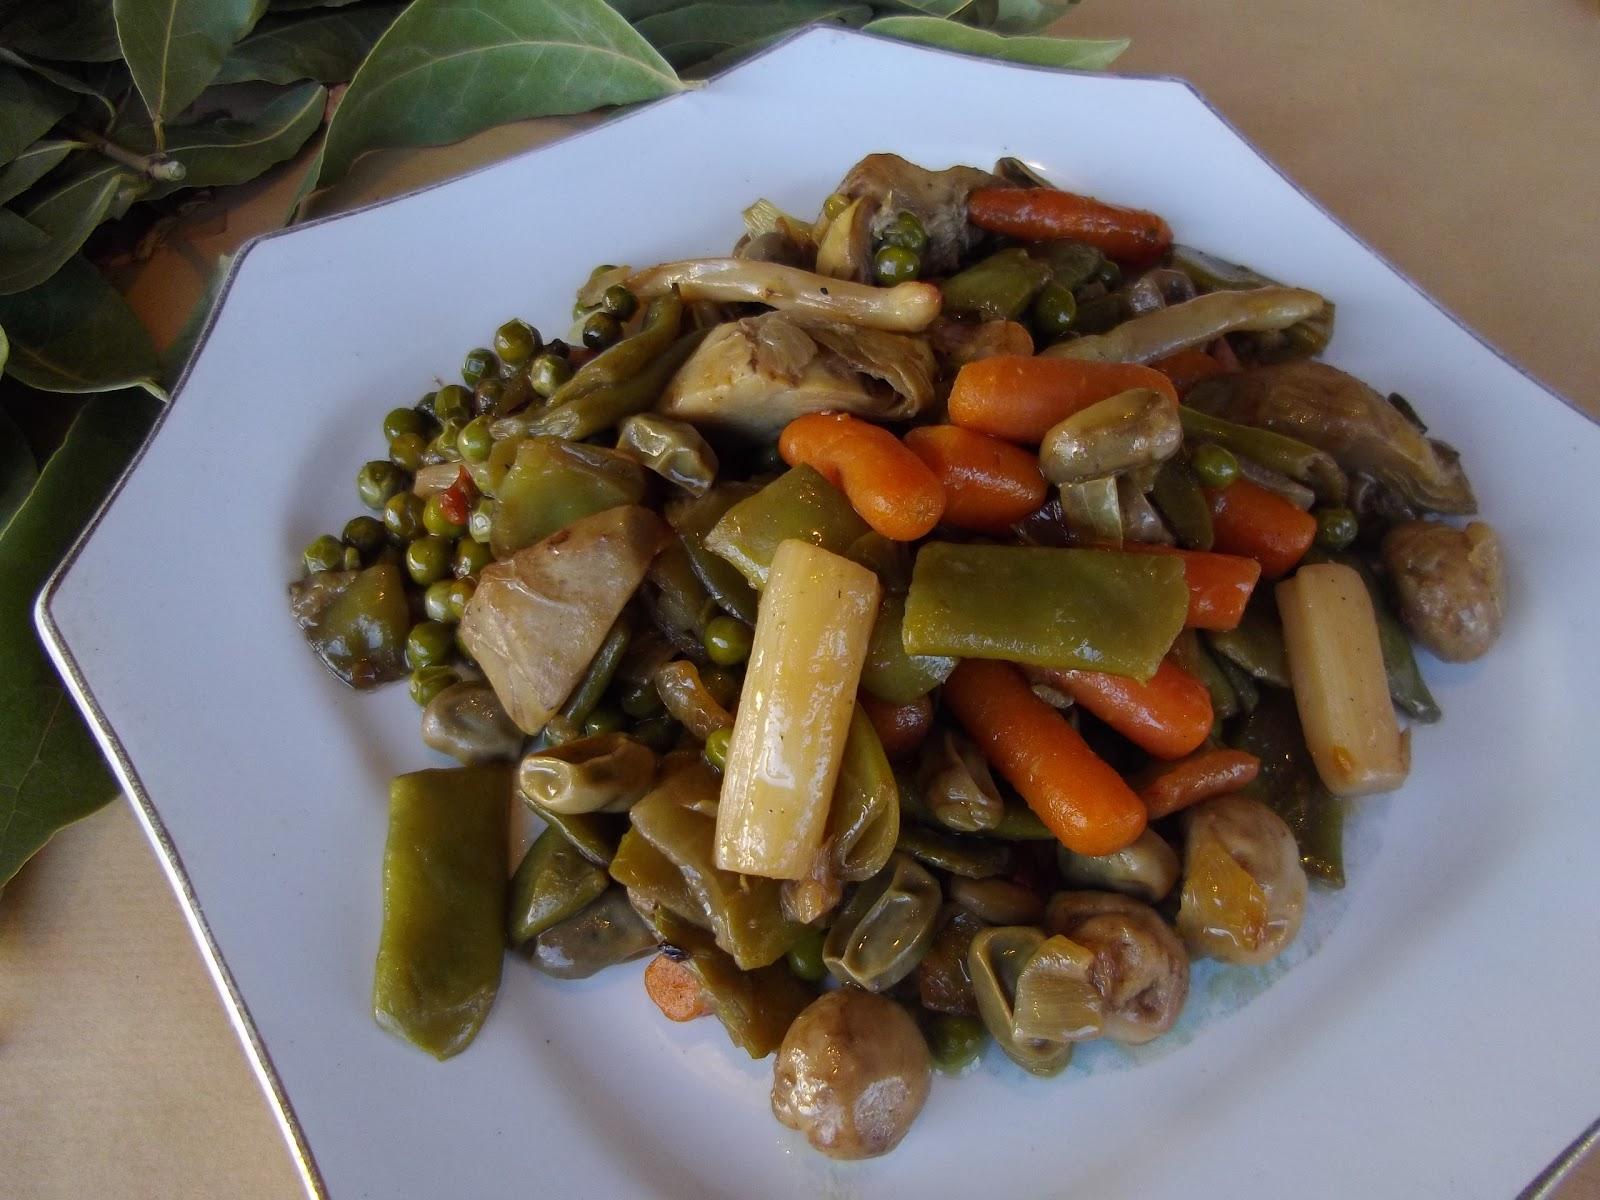 Cocina sin problemas menestra de verduras con congelados - Como preparar menestra de verduras ...